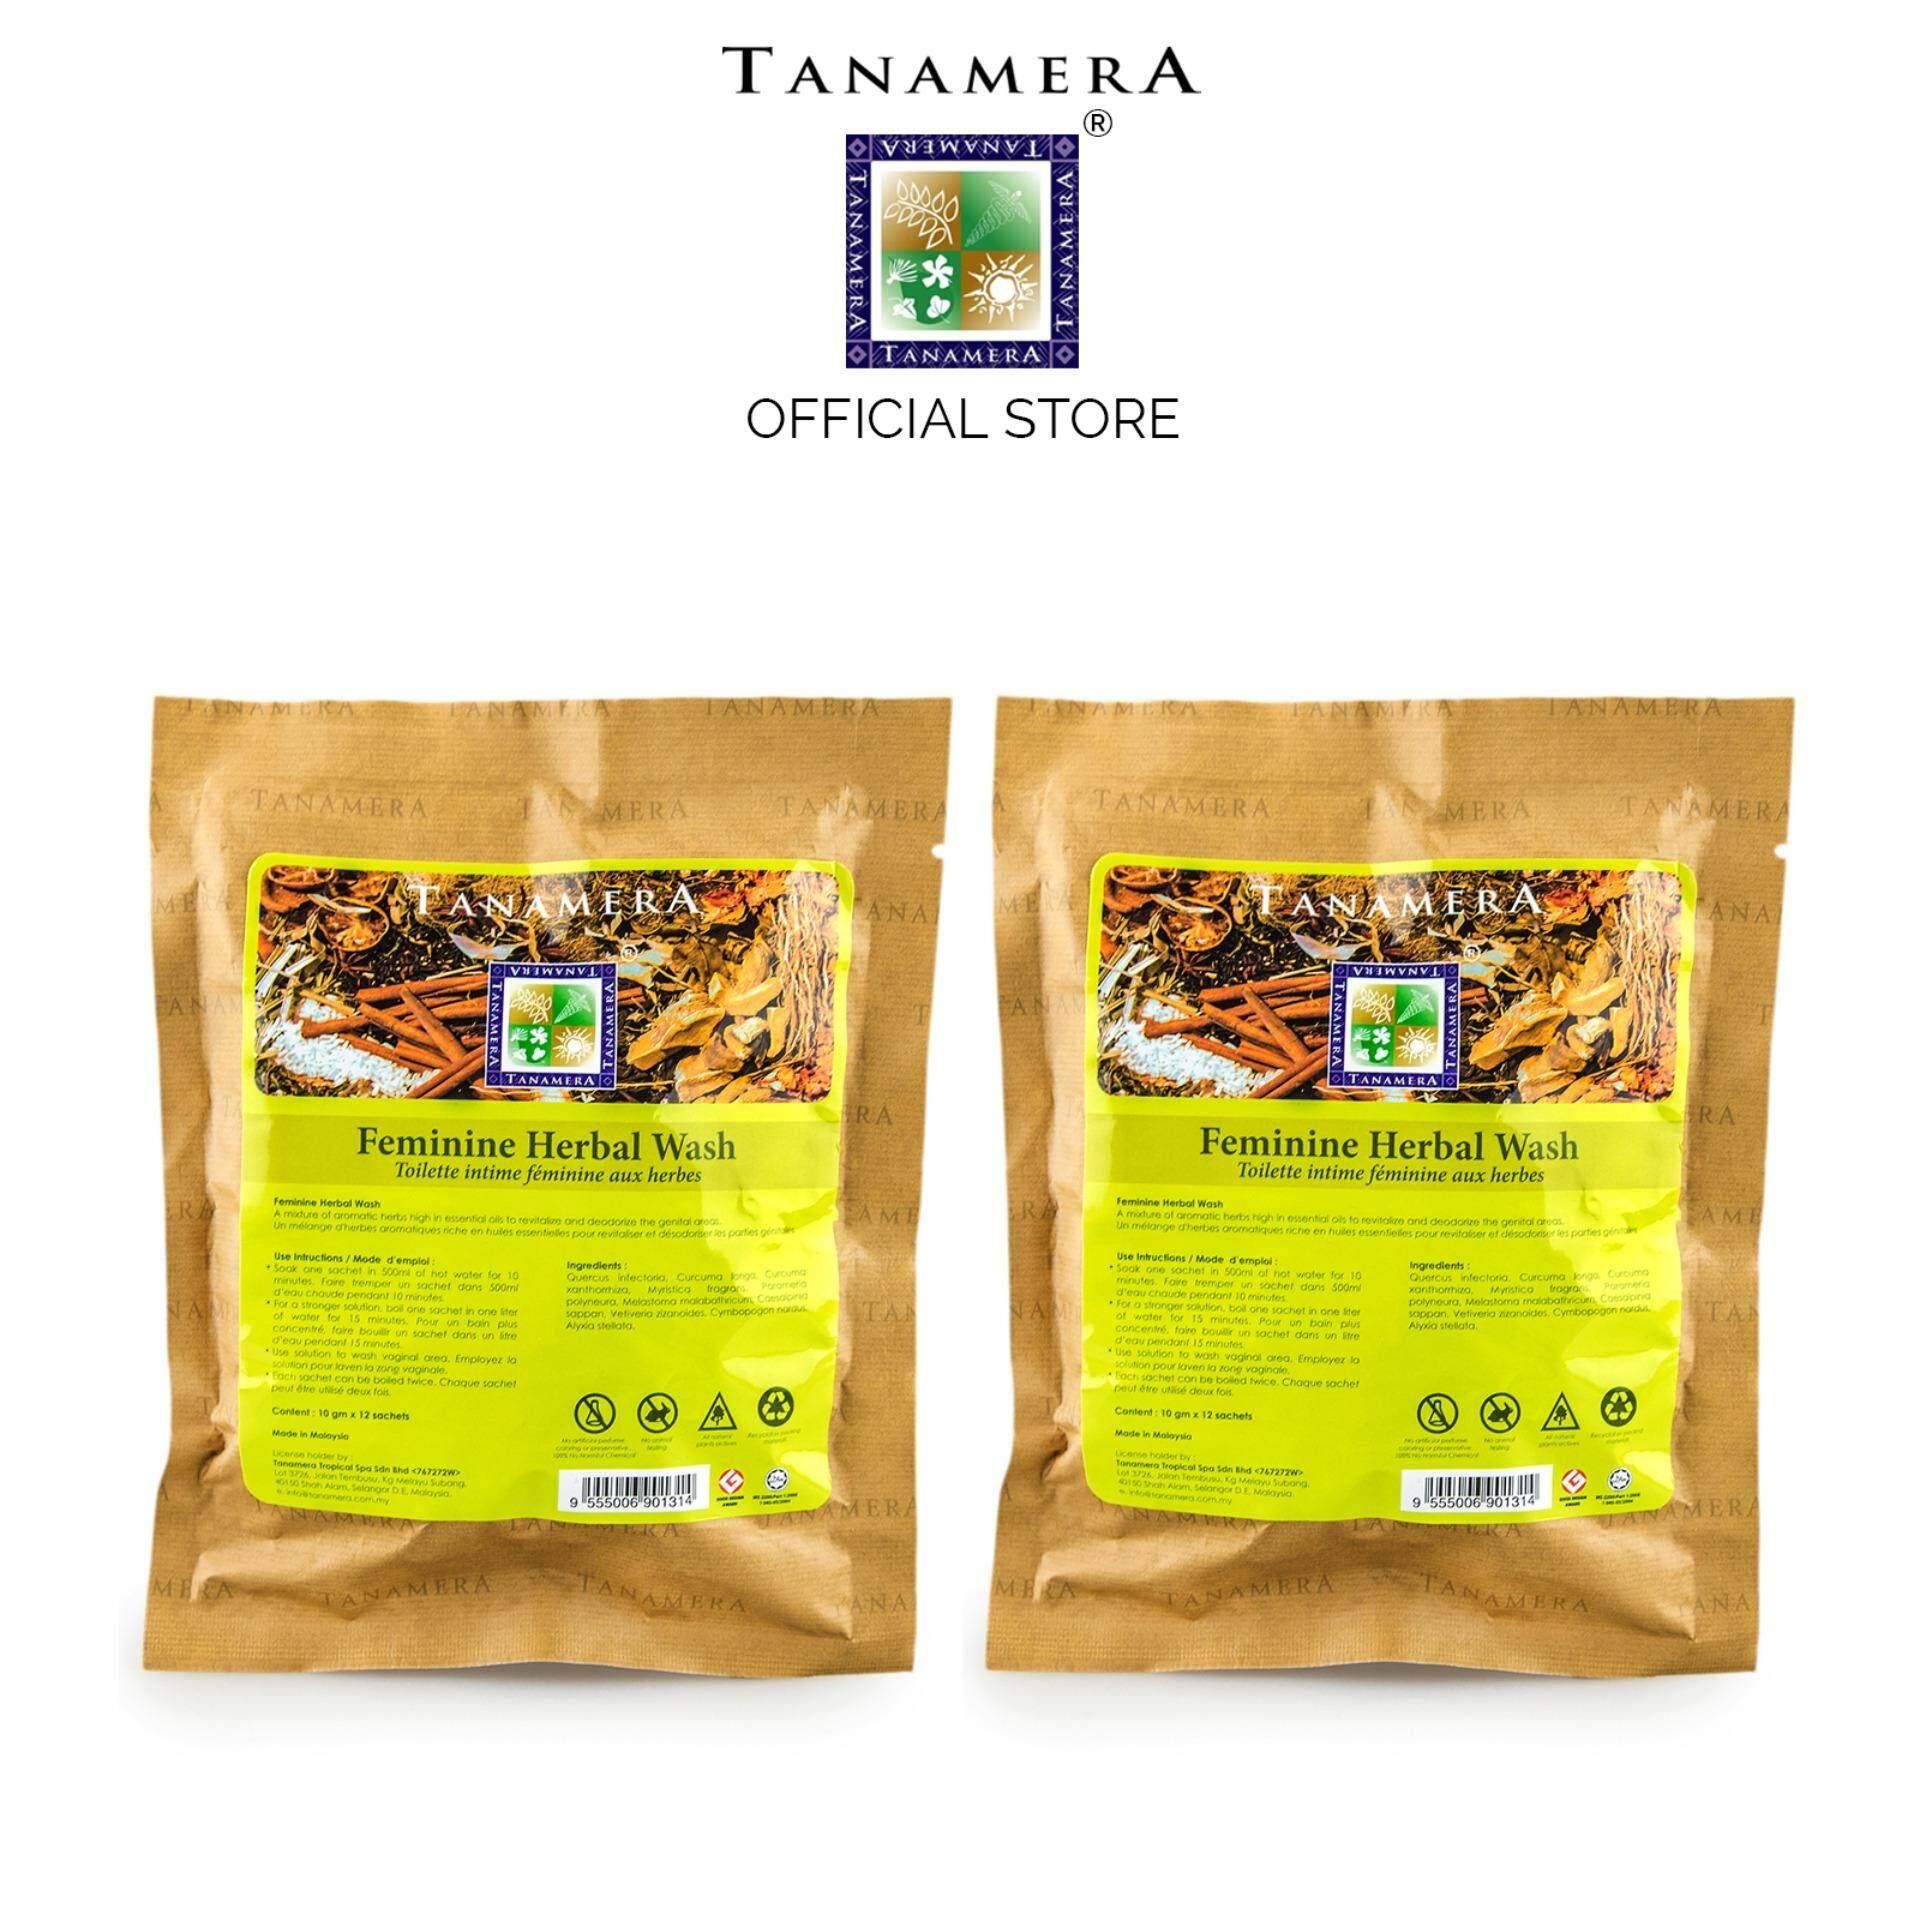 Tanamera Feminine Herbal Wash 120g x 2